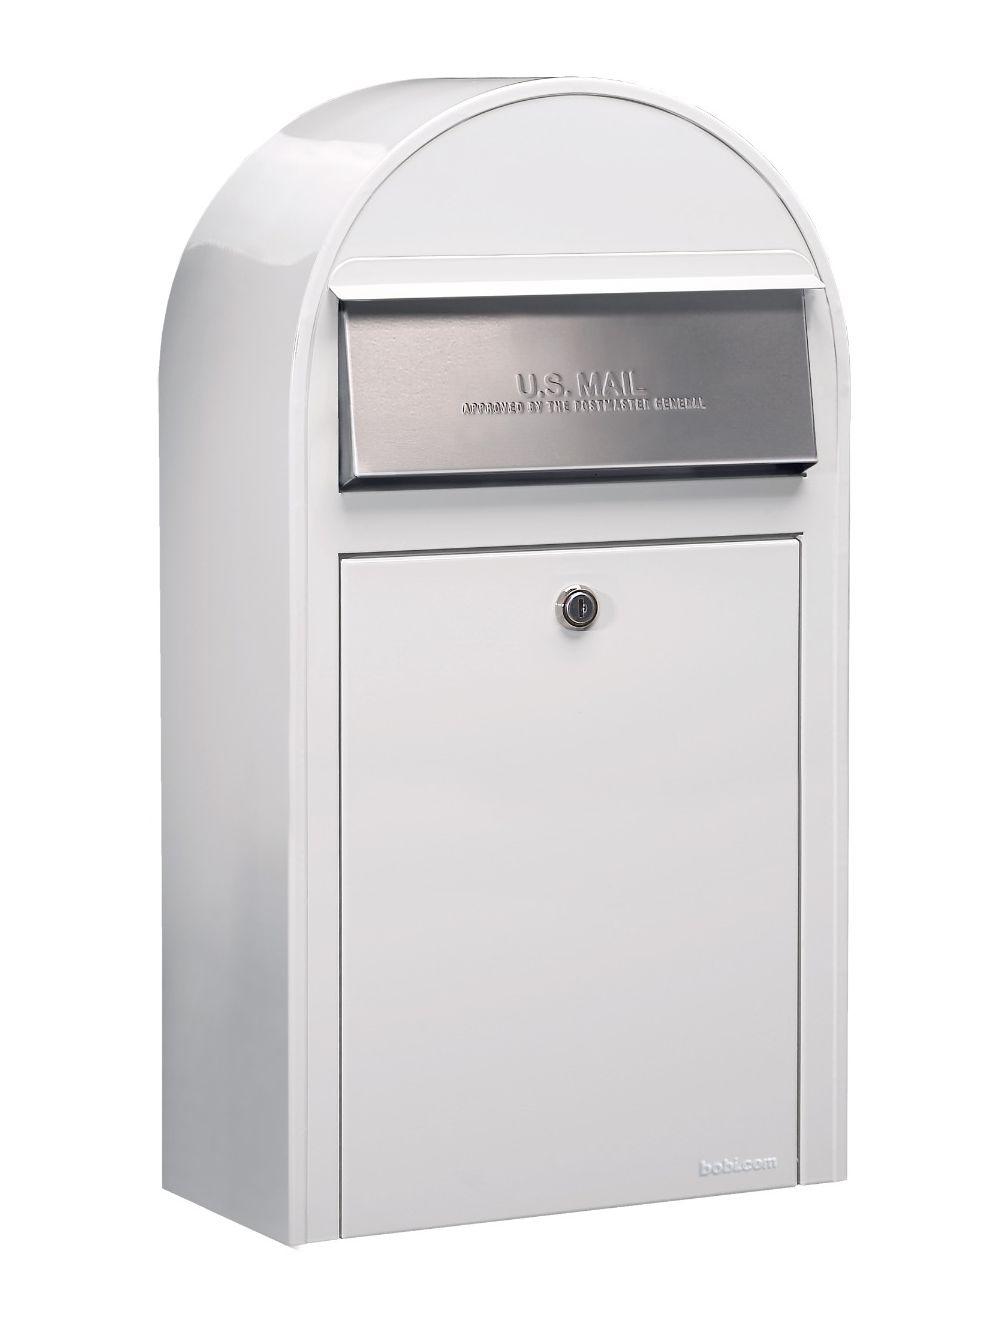 USPS Bobi Grande (S) Slim White Mailbox